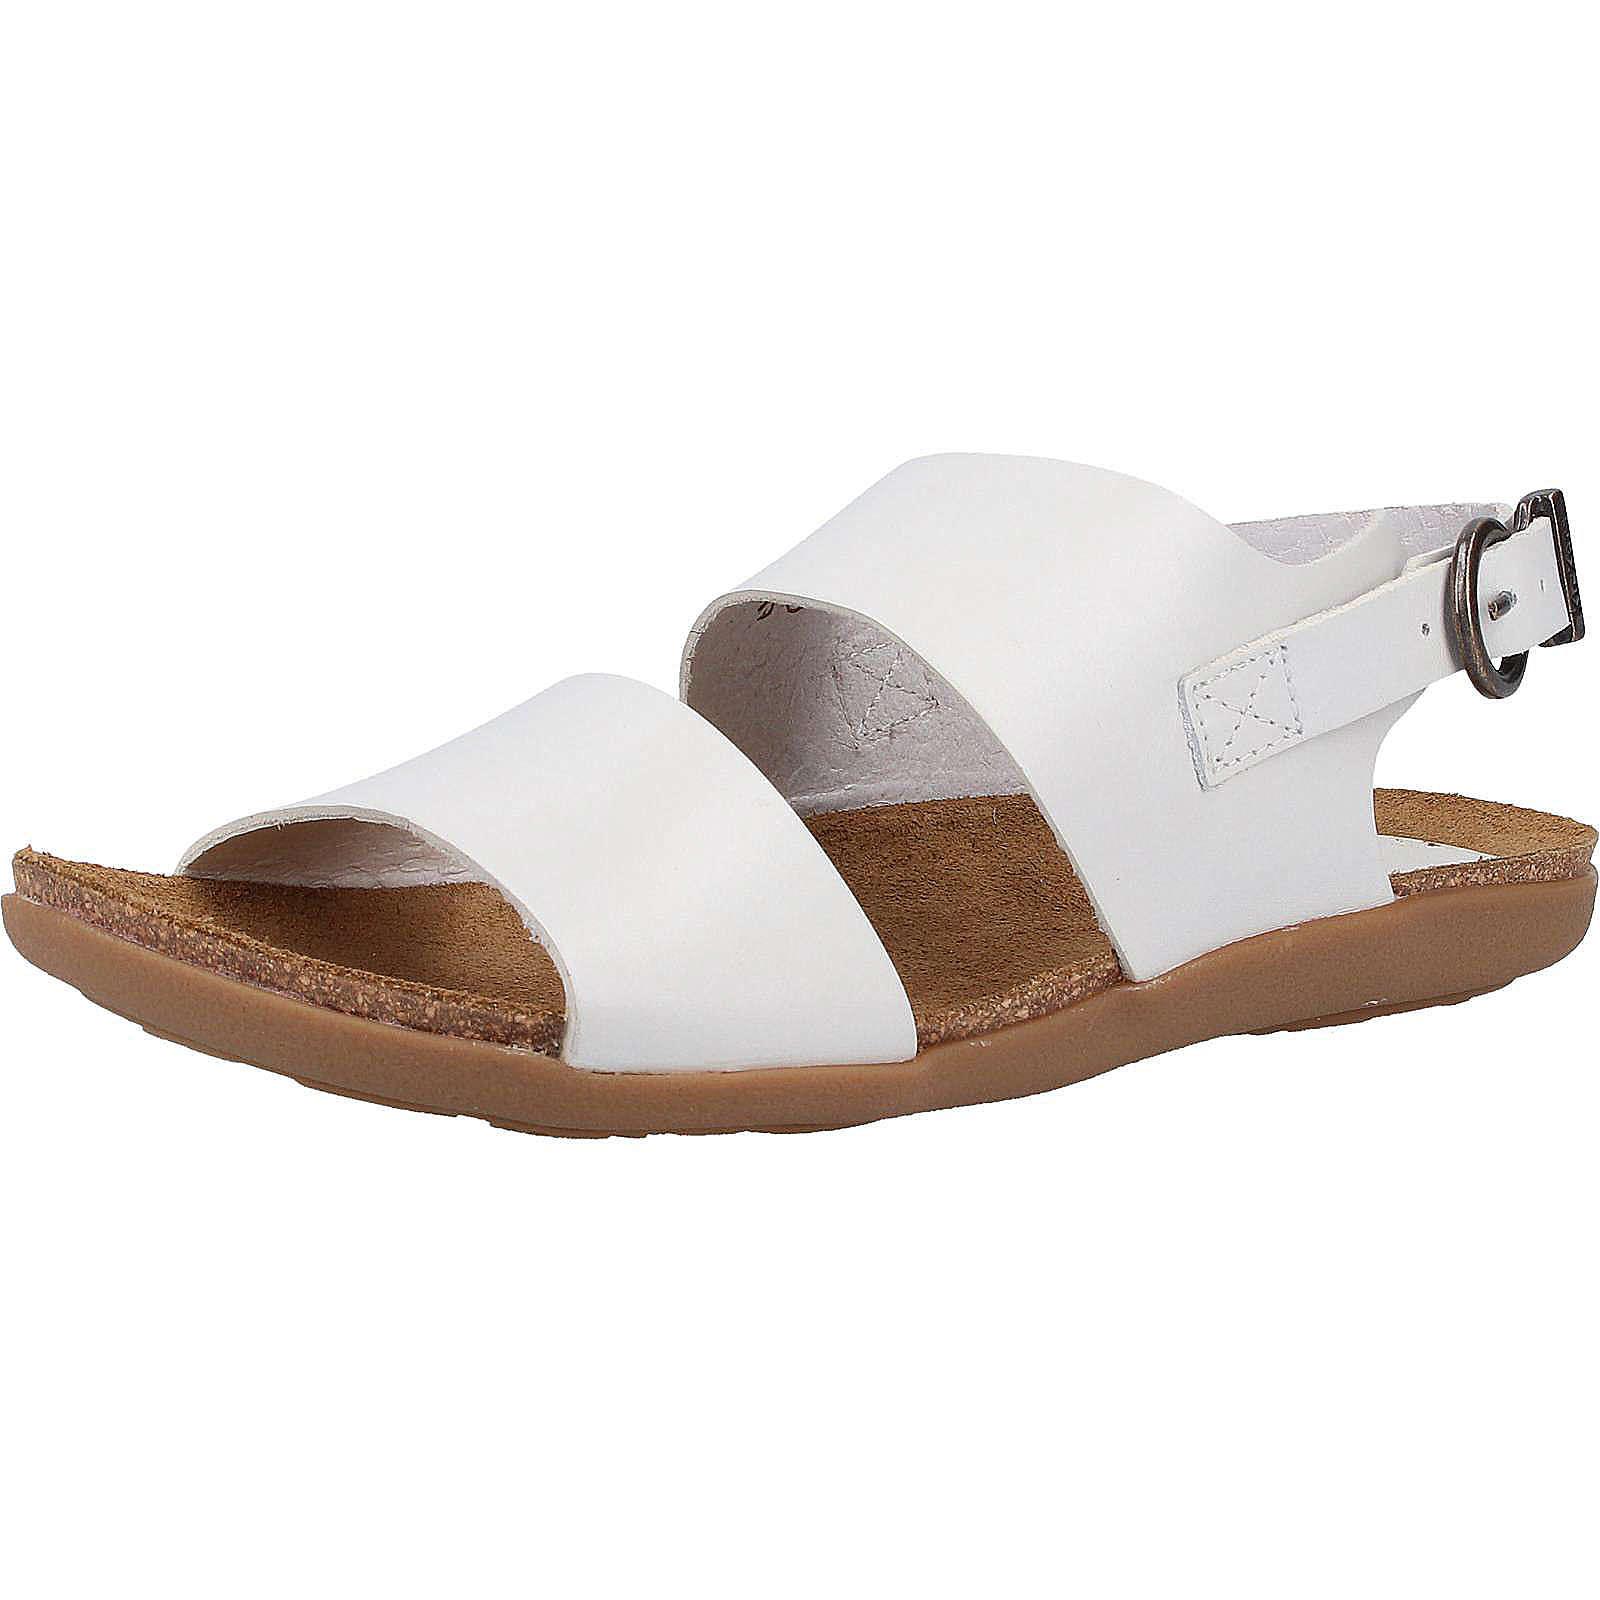 KicKers Sandalen Klassische Sandaletten weiß Damen Gr. 37